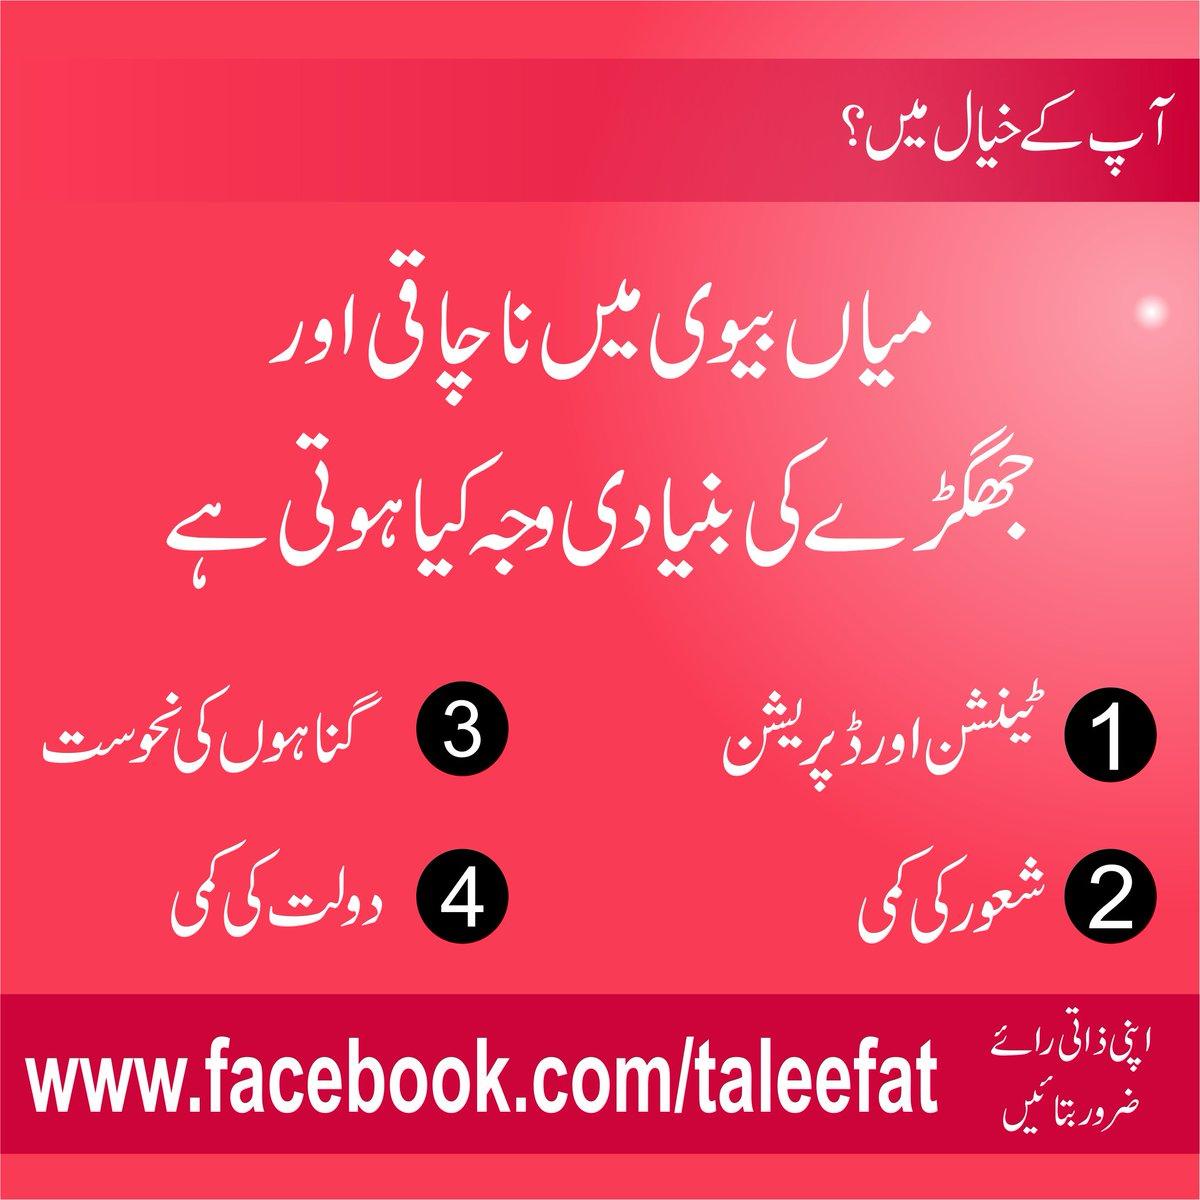 Taleefat E Ashrafia Bookstore on Twitter: